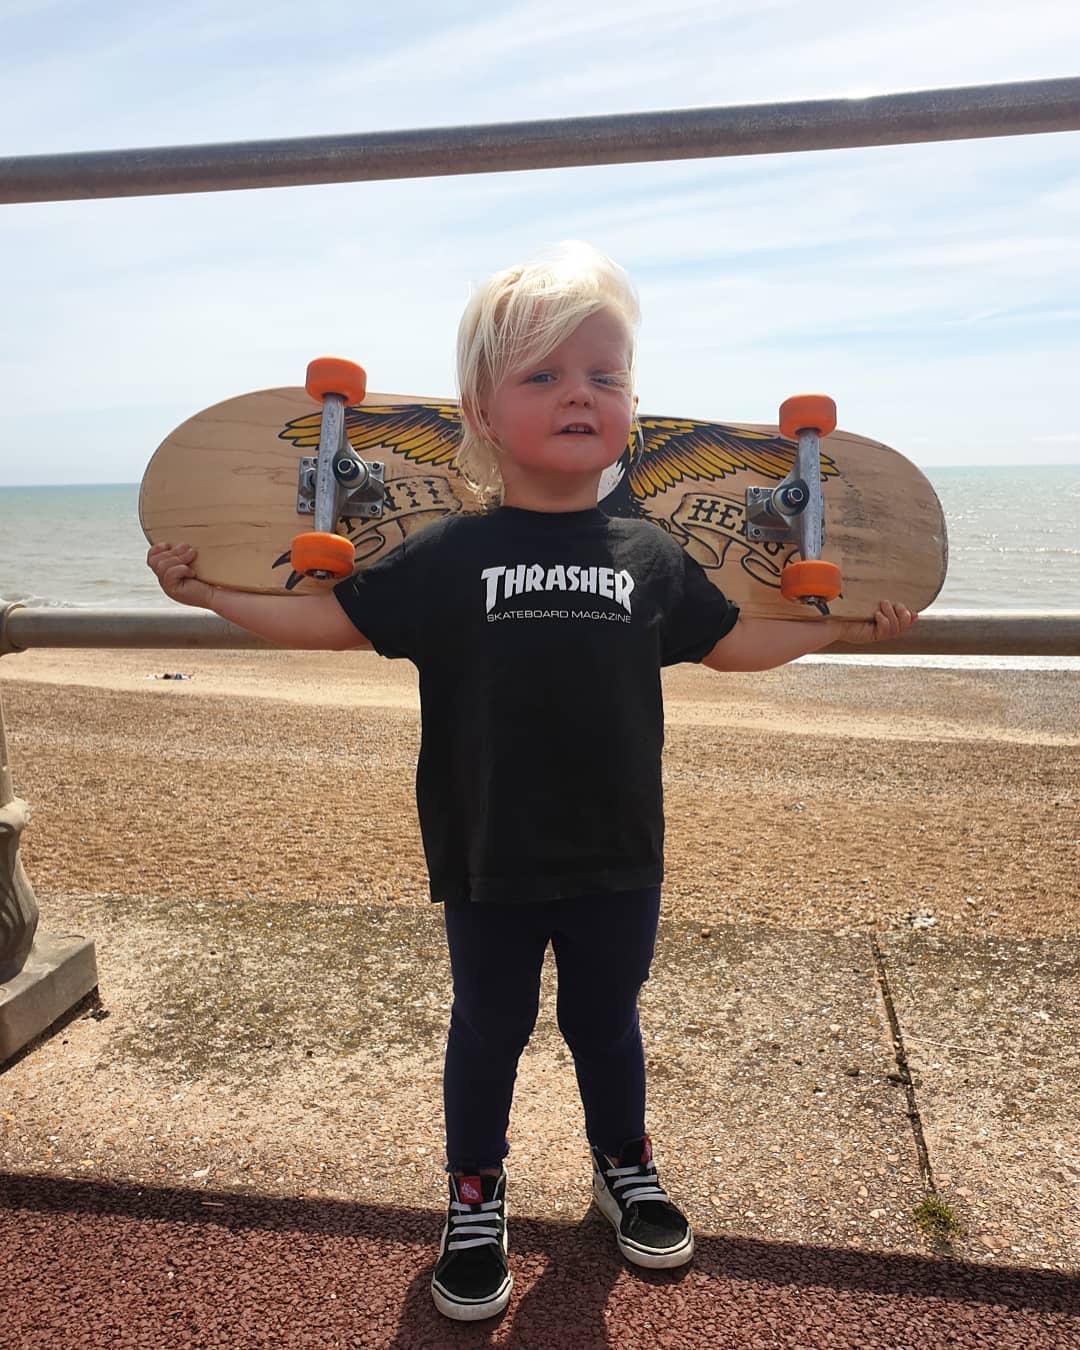 Conoce a Autumn California Bailey, la skater badass de 3 años que se hizo viral en Instagram